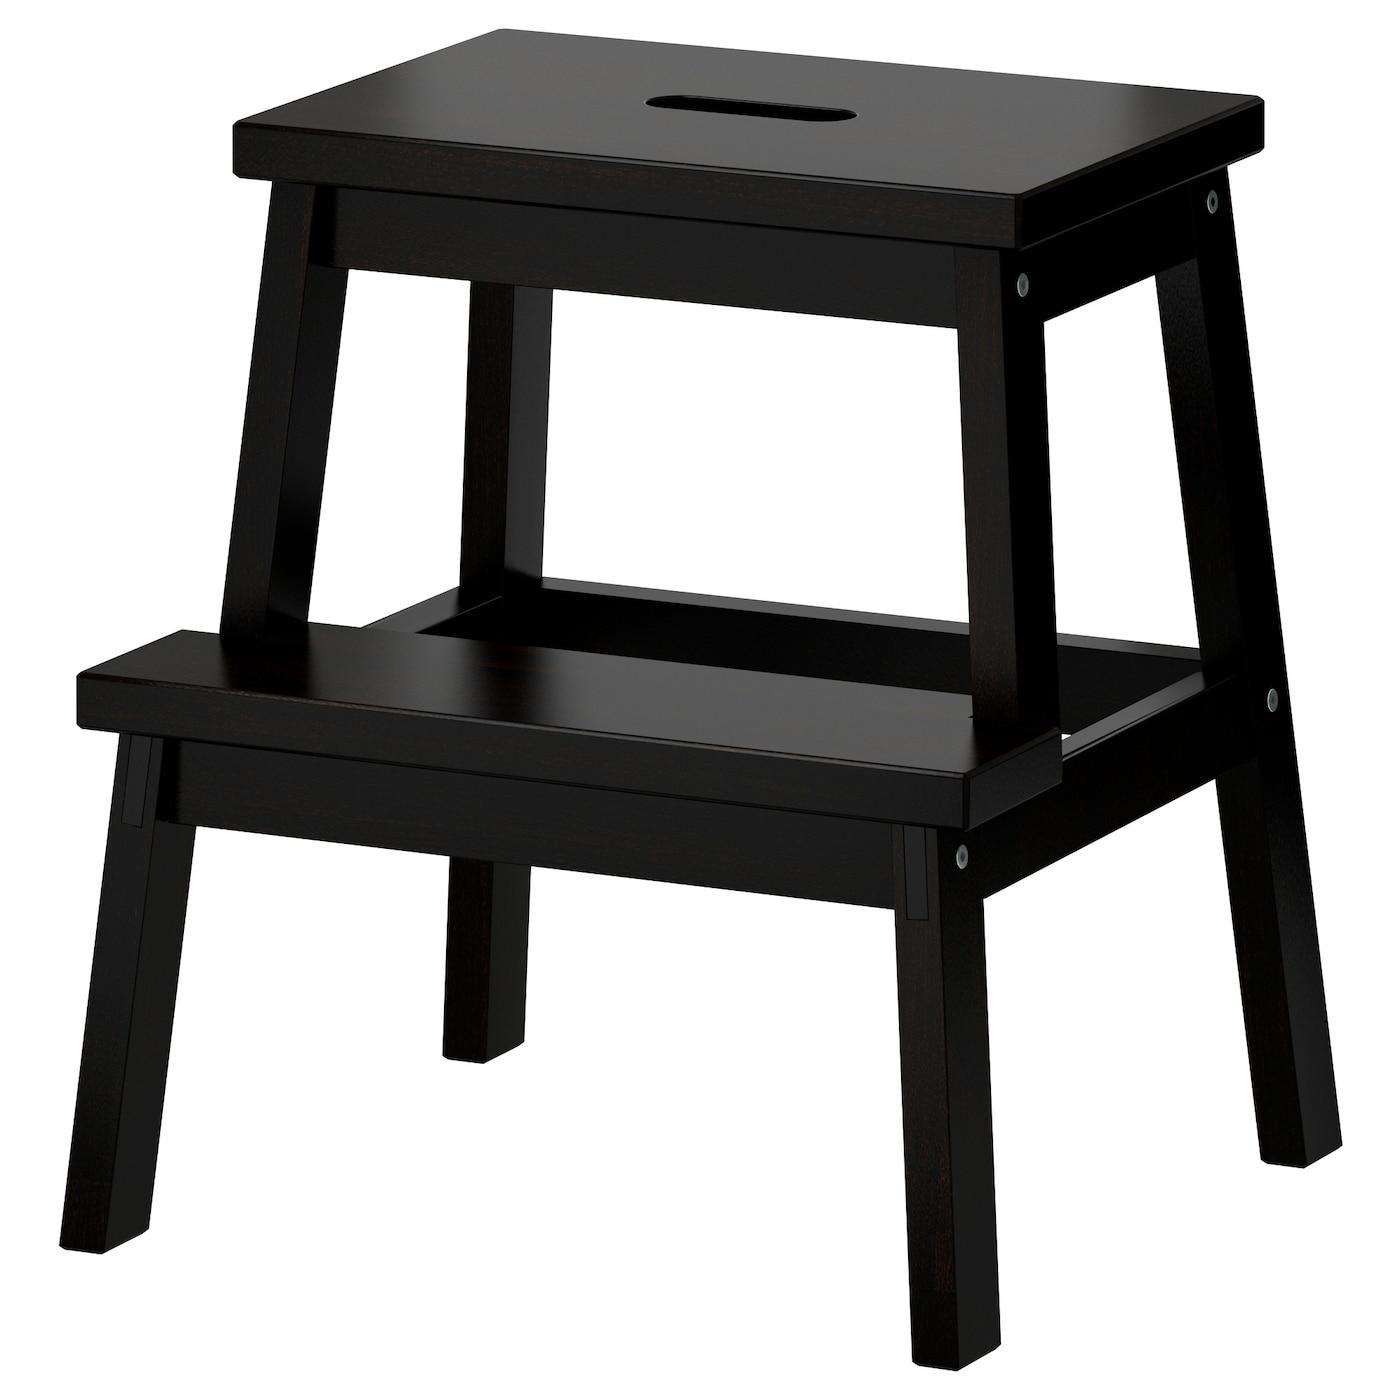 bekv m marchepied noir 50 cm ikea. Black Bedroom Furniture Sets. Home Design Ideas